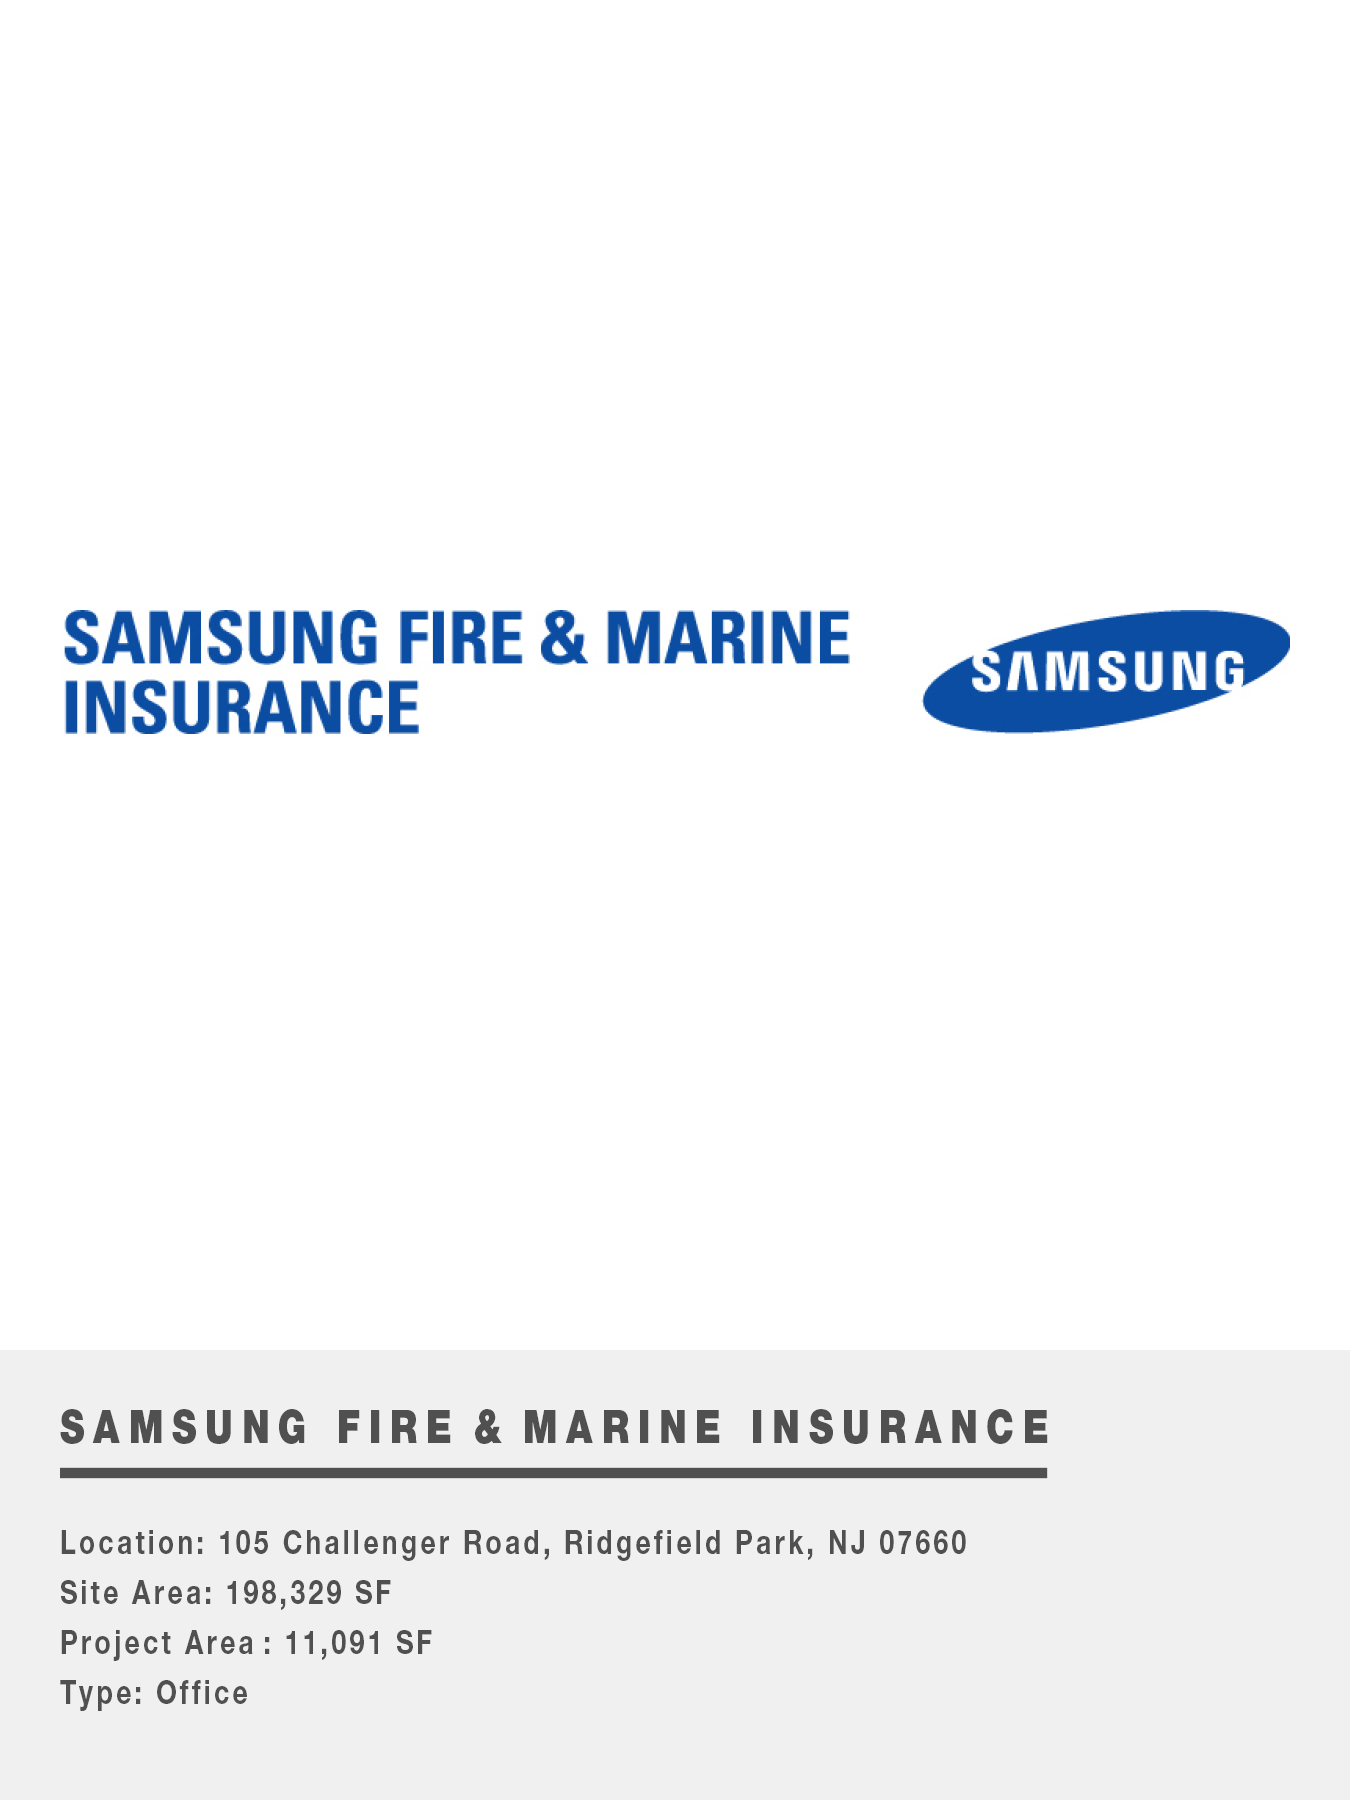 SAMSUNG FIRE & MARINE INSURANCE